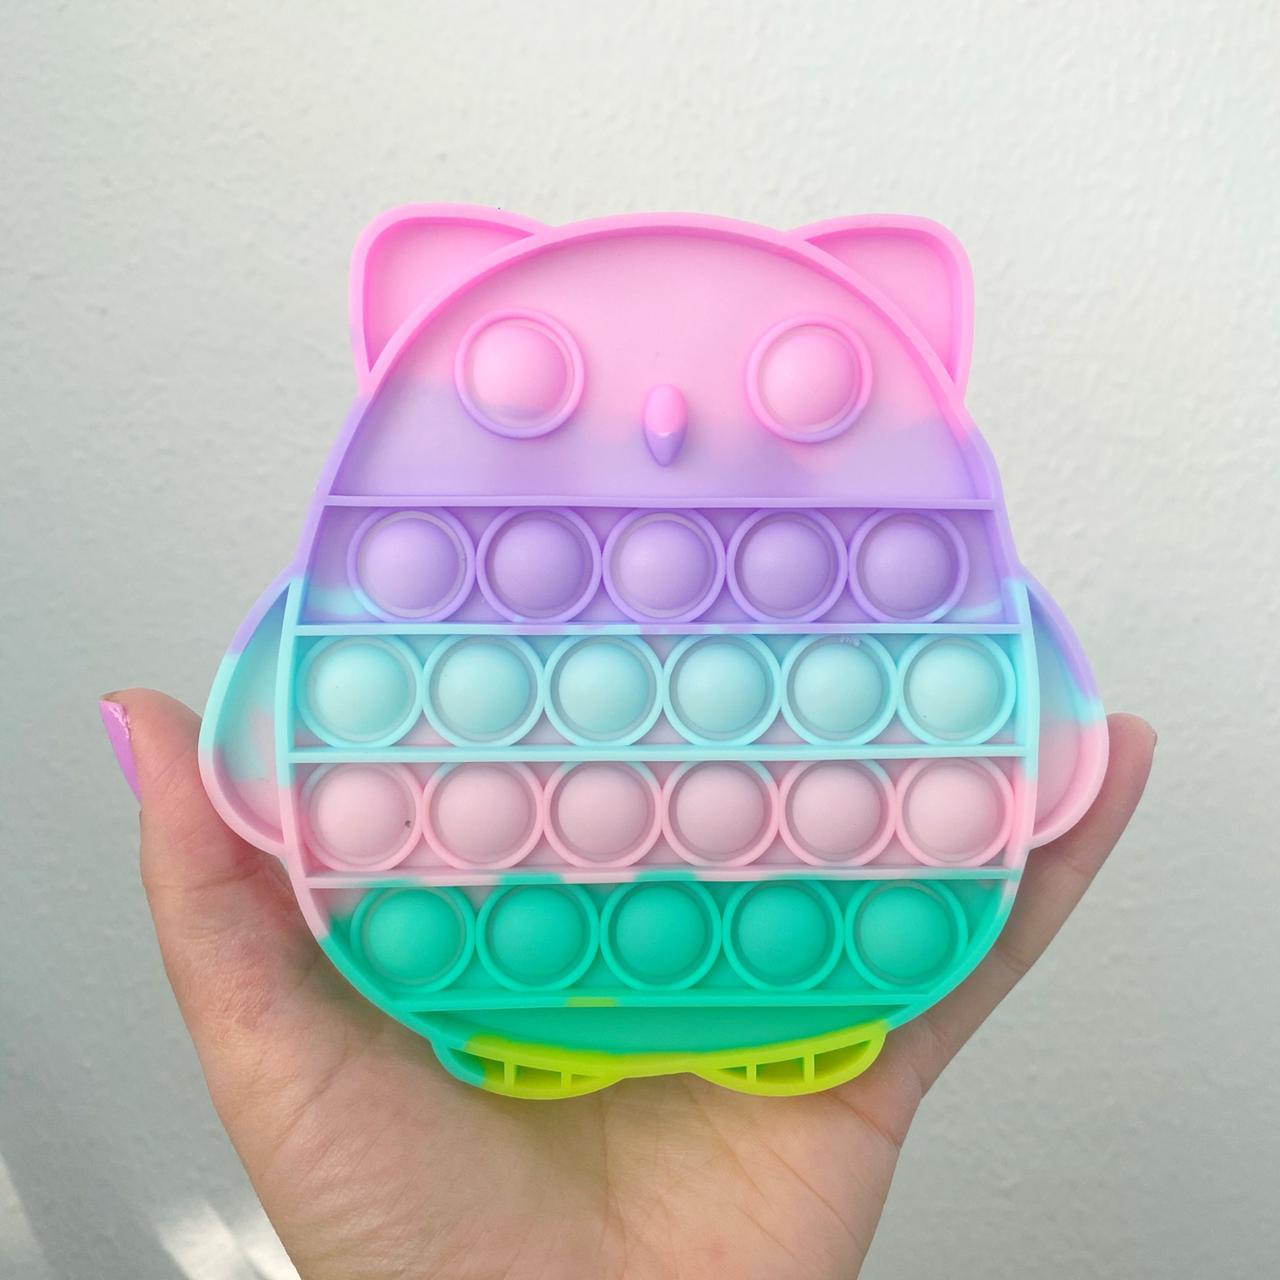 Pop Popit de Silicone Fidget Toy Brinquedo Anti stress Relaxante Cor Tom Pastel  Importado